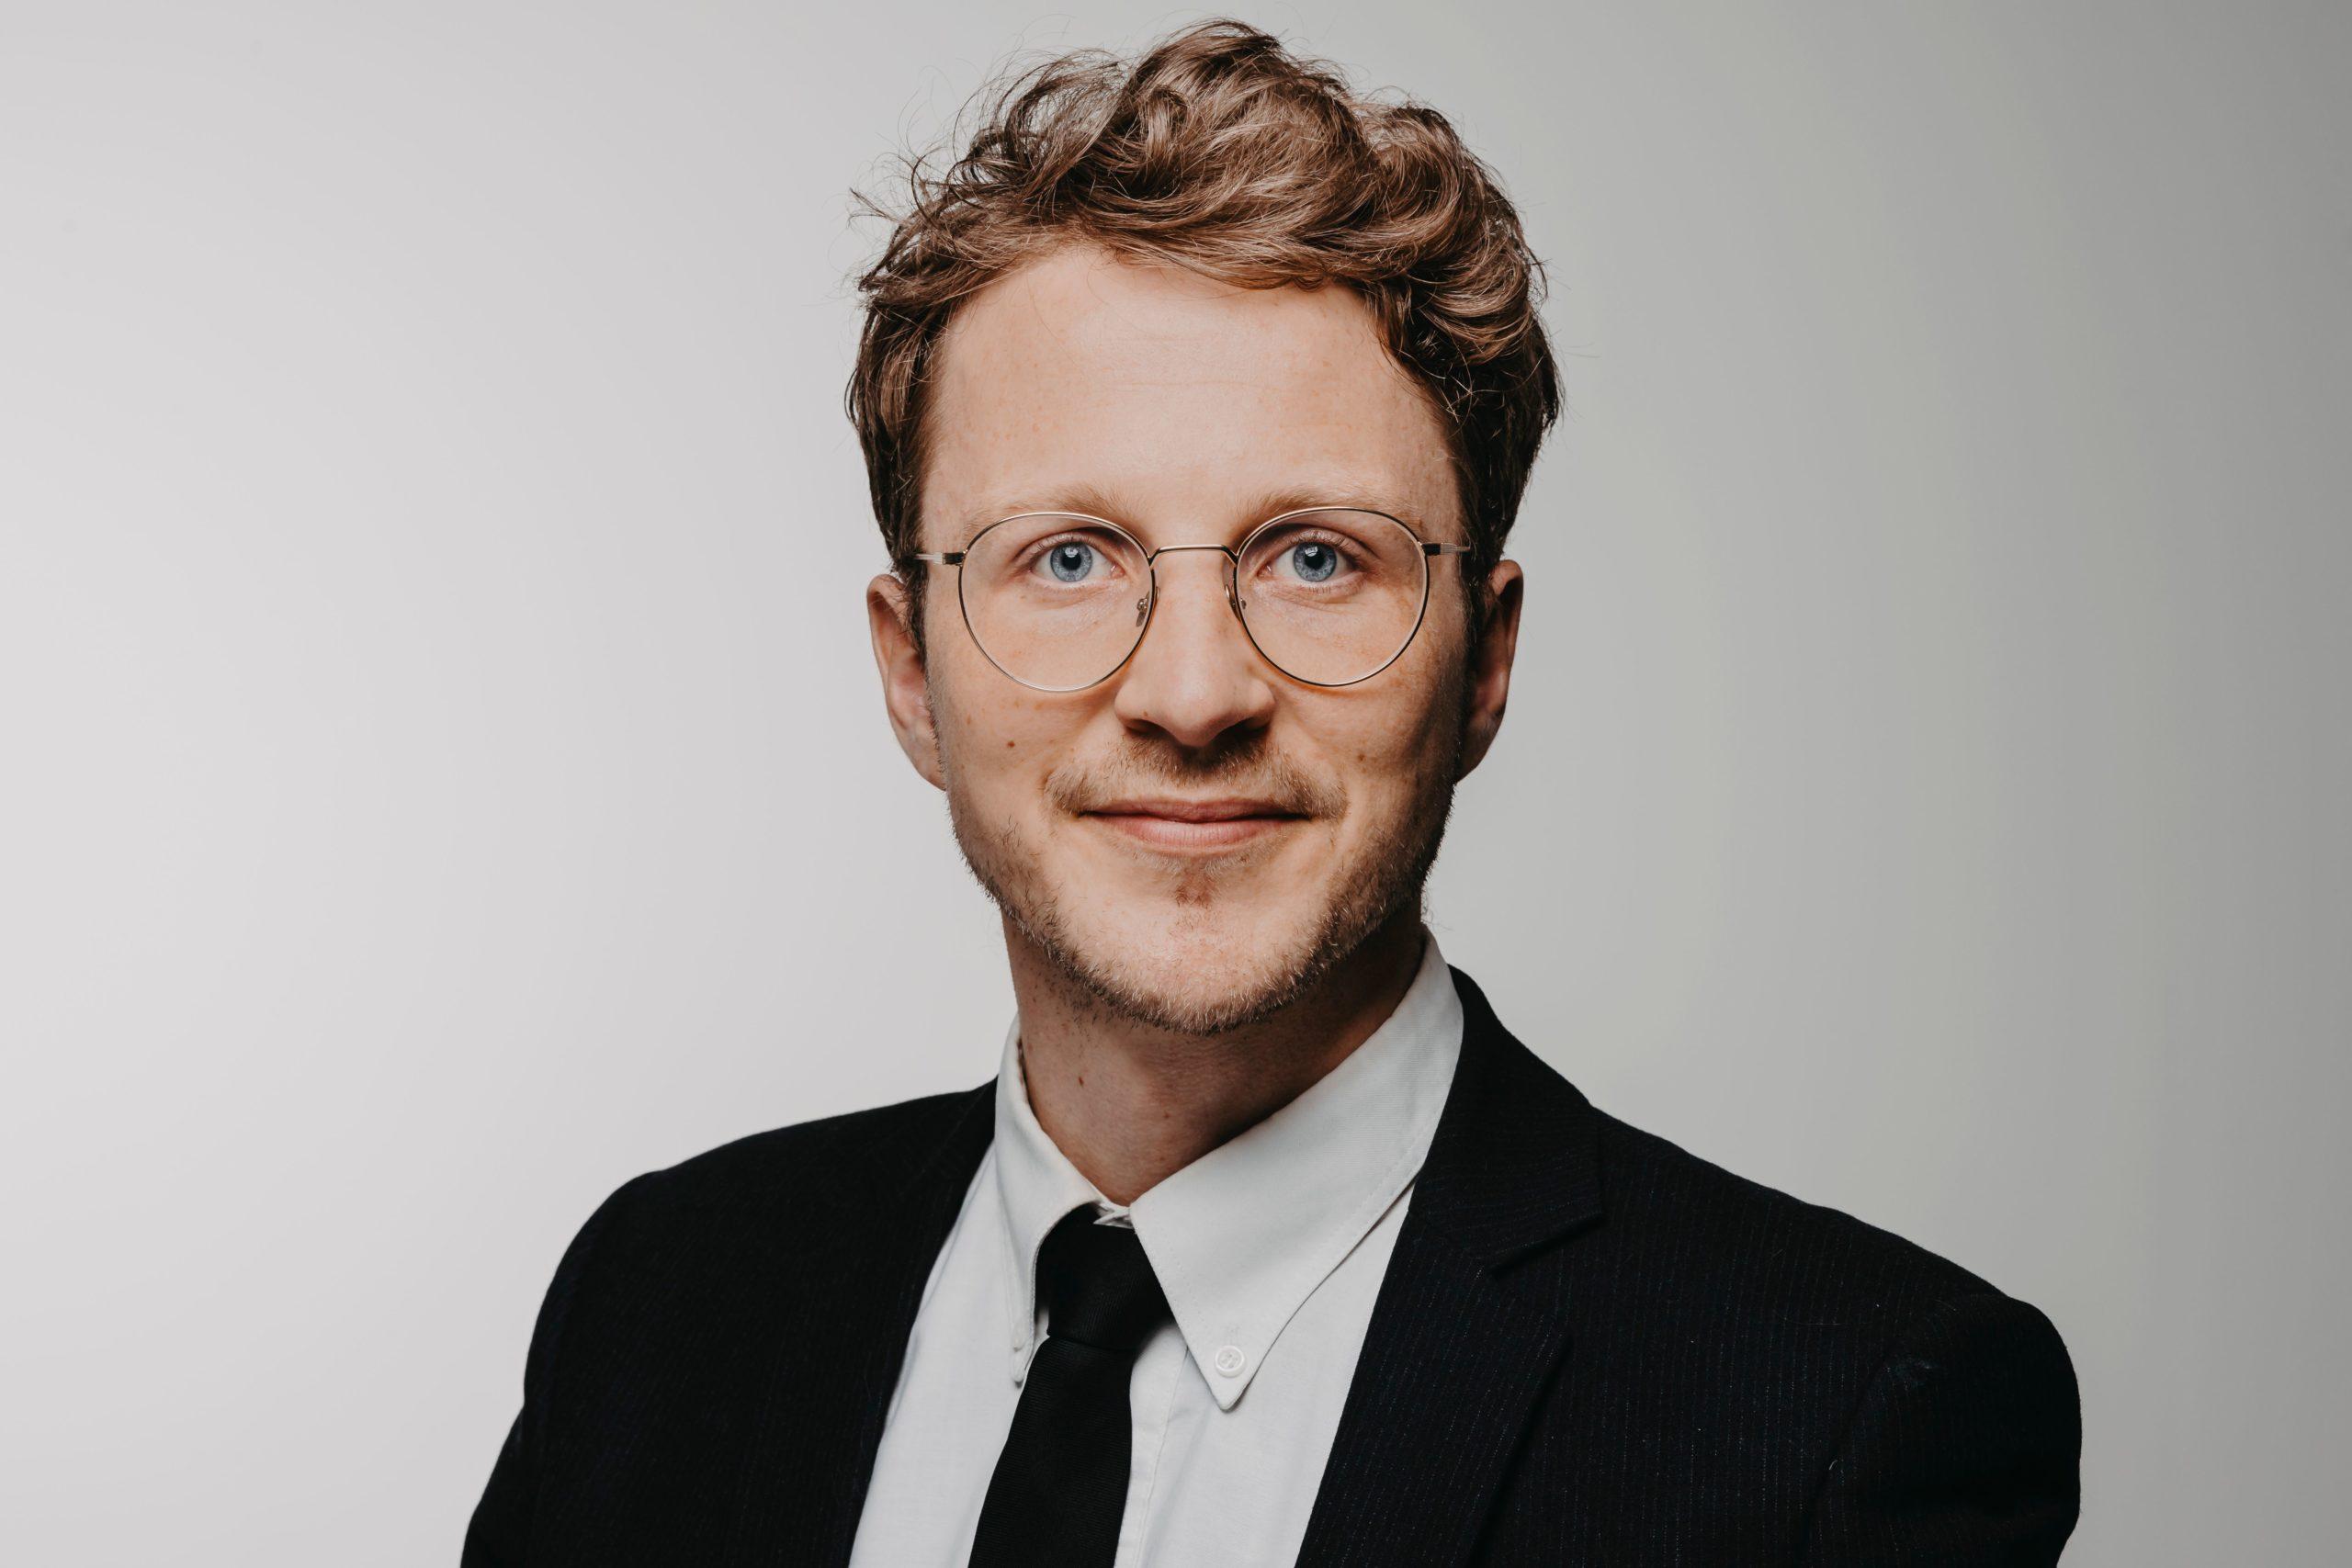 Anders Bodenhoff Vejby